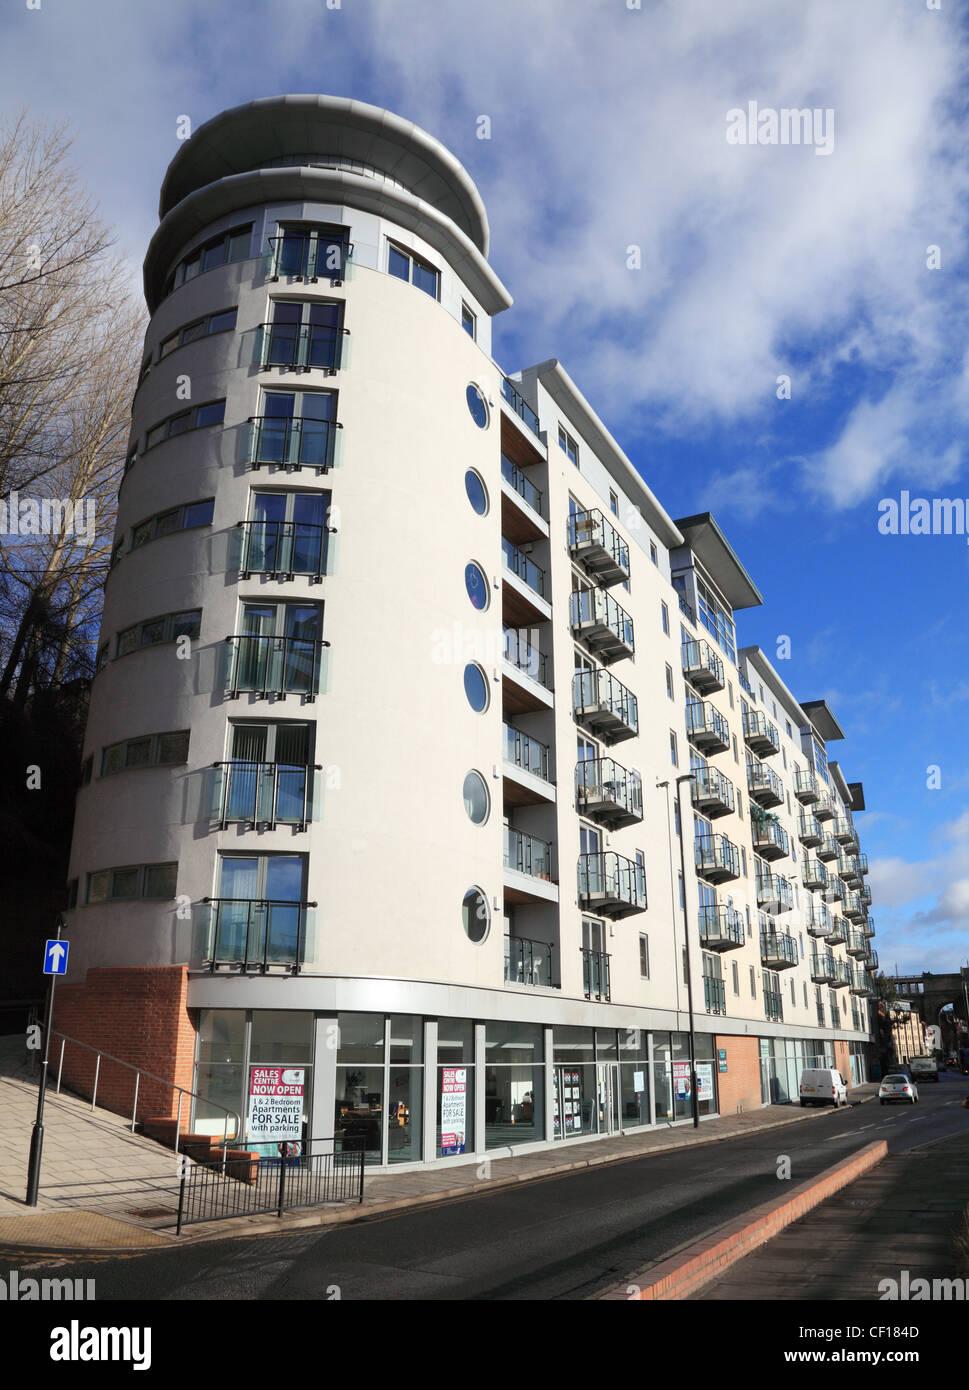 Modern block of flats newastle upon tyne quayside england uk stock image